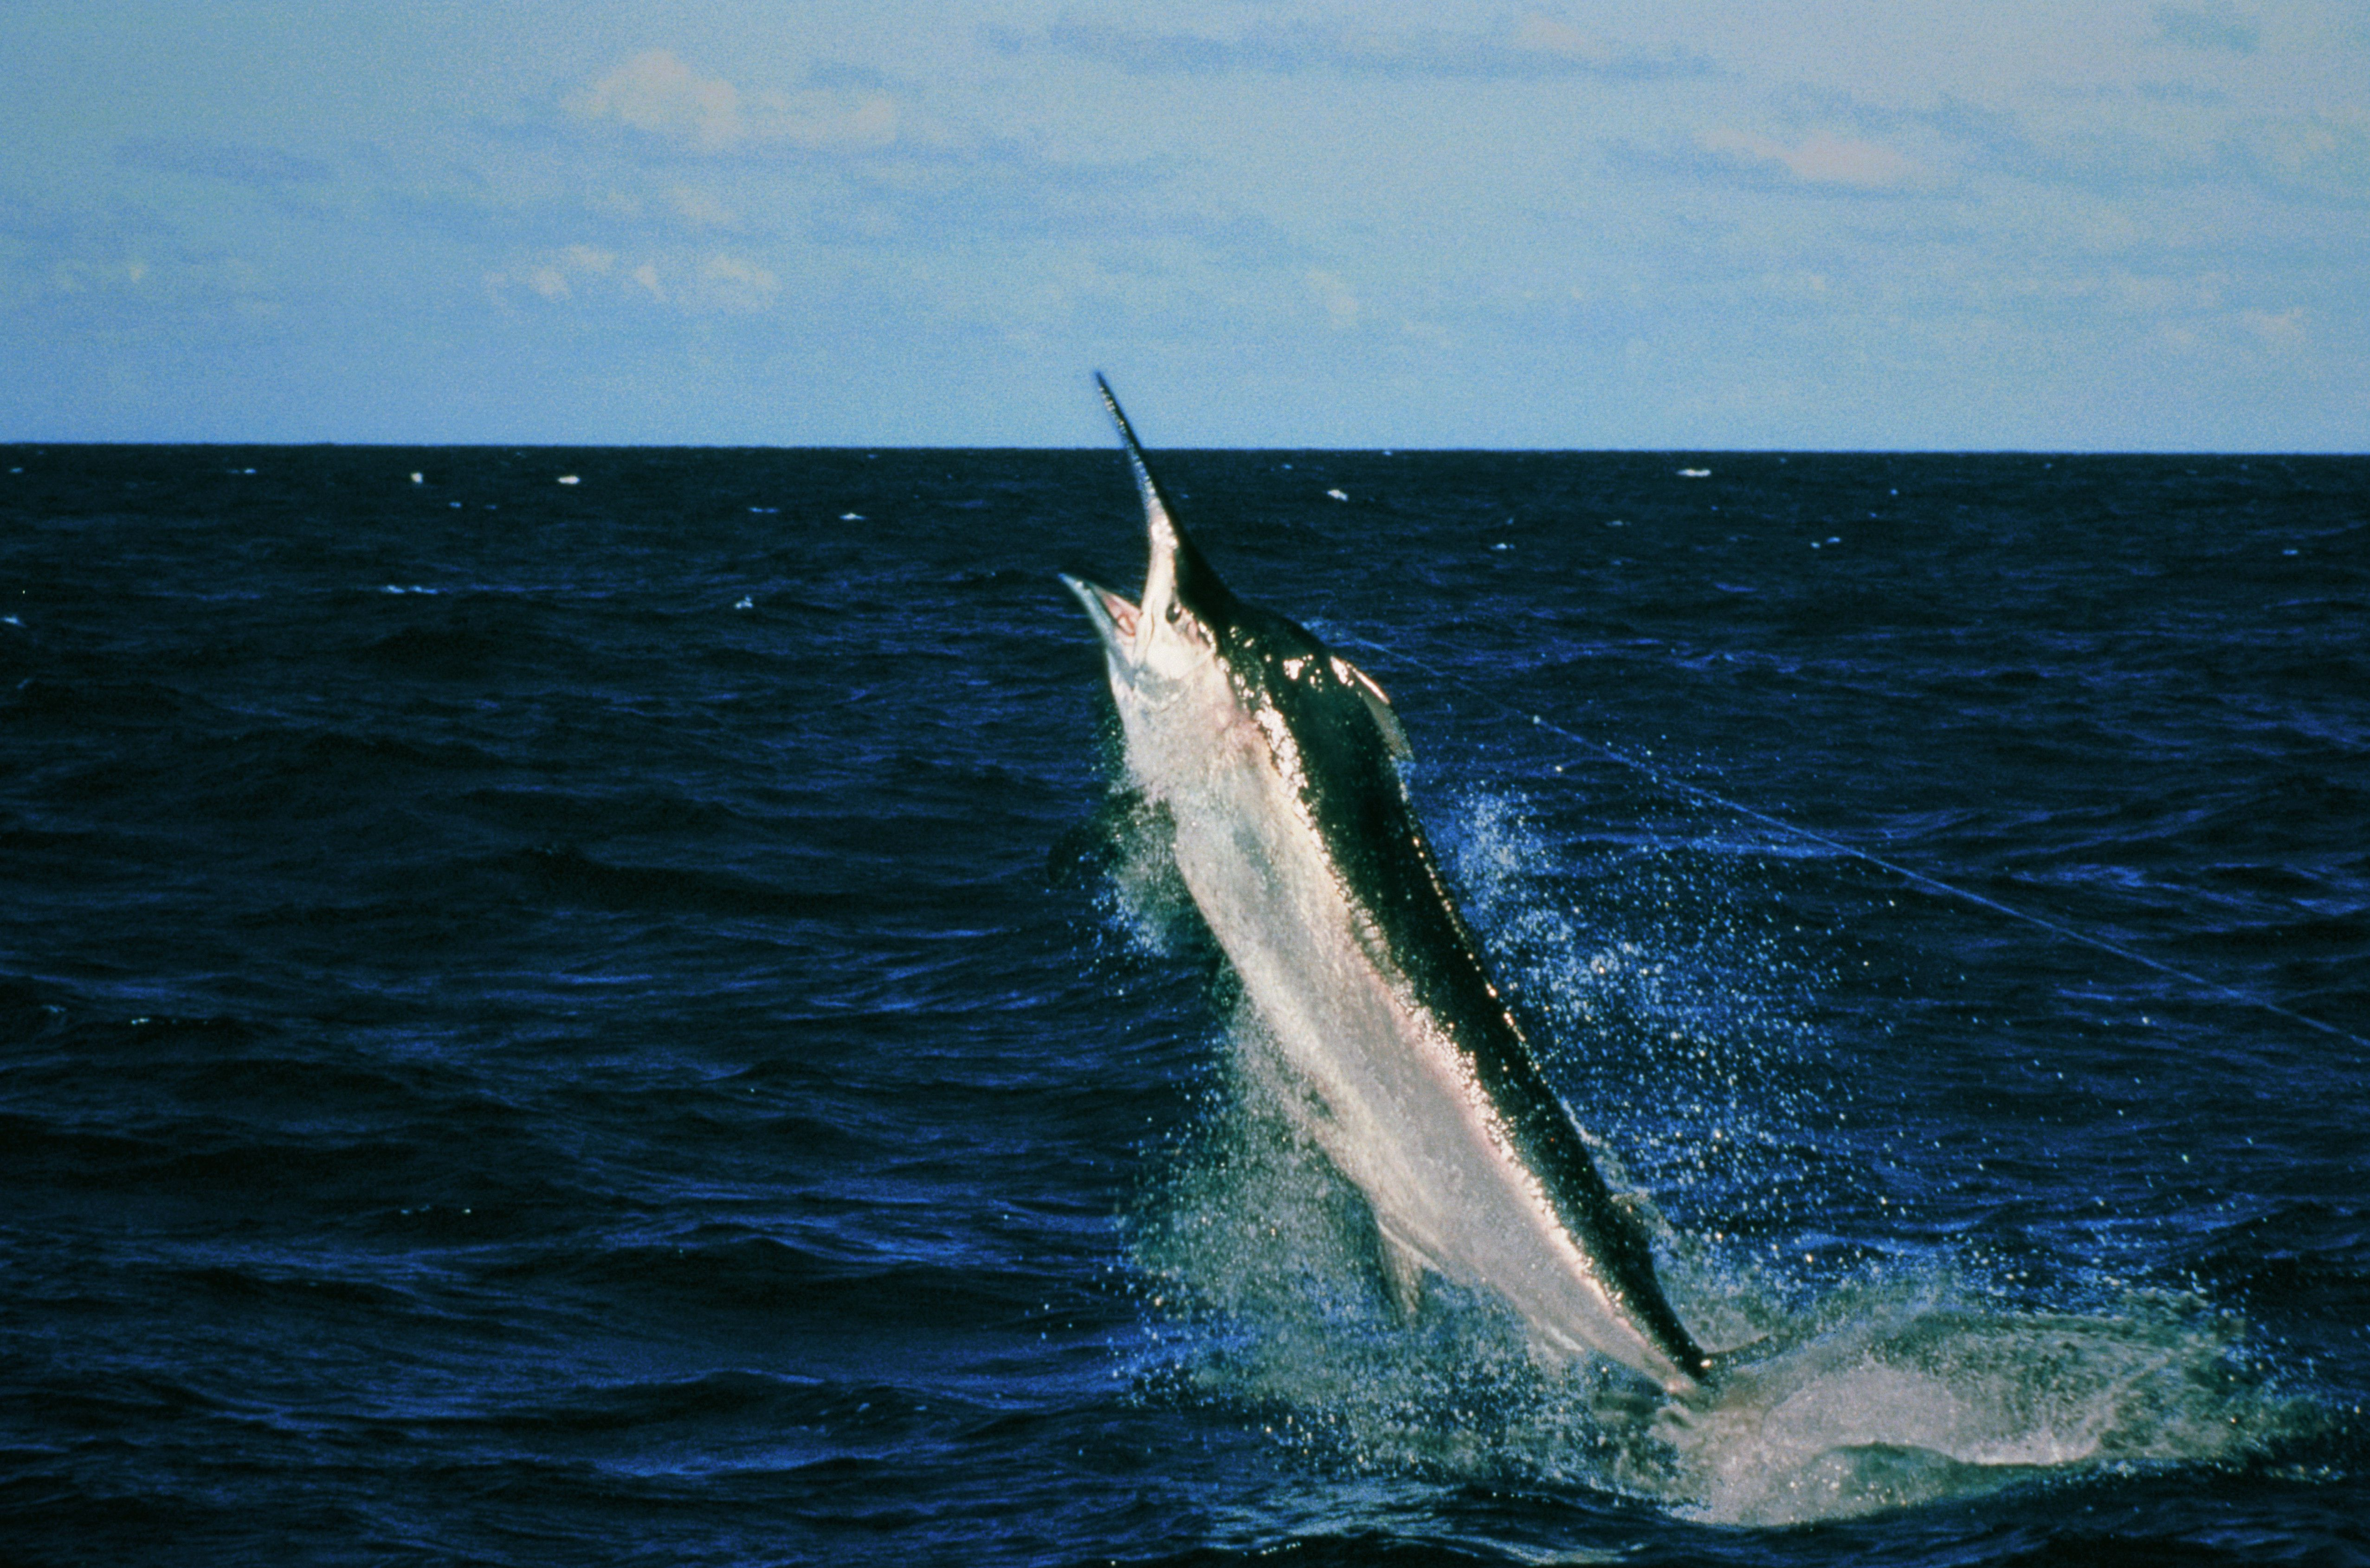 Black Marlin (Makaira indica) struggles against a fishing line